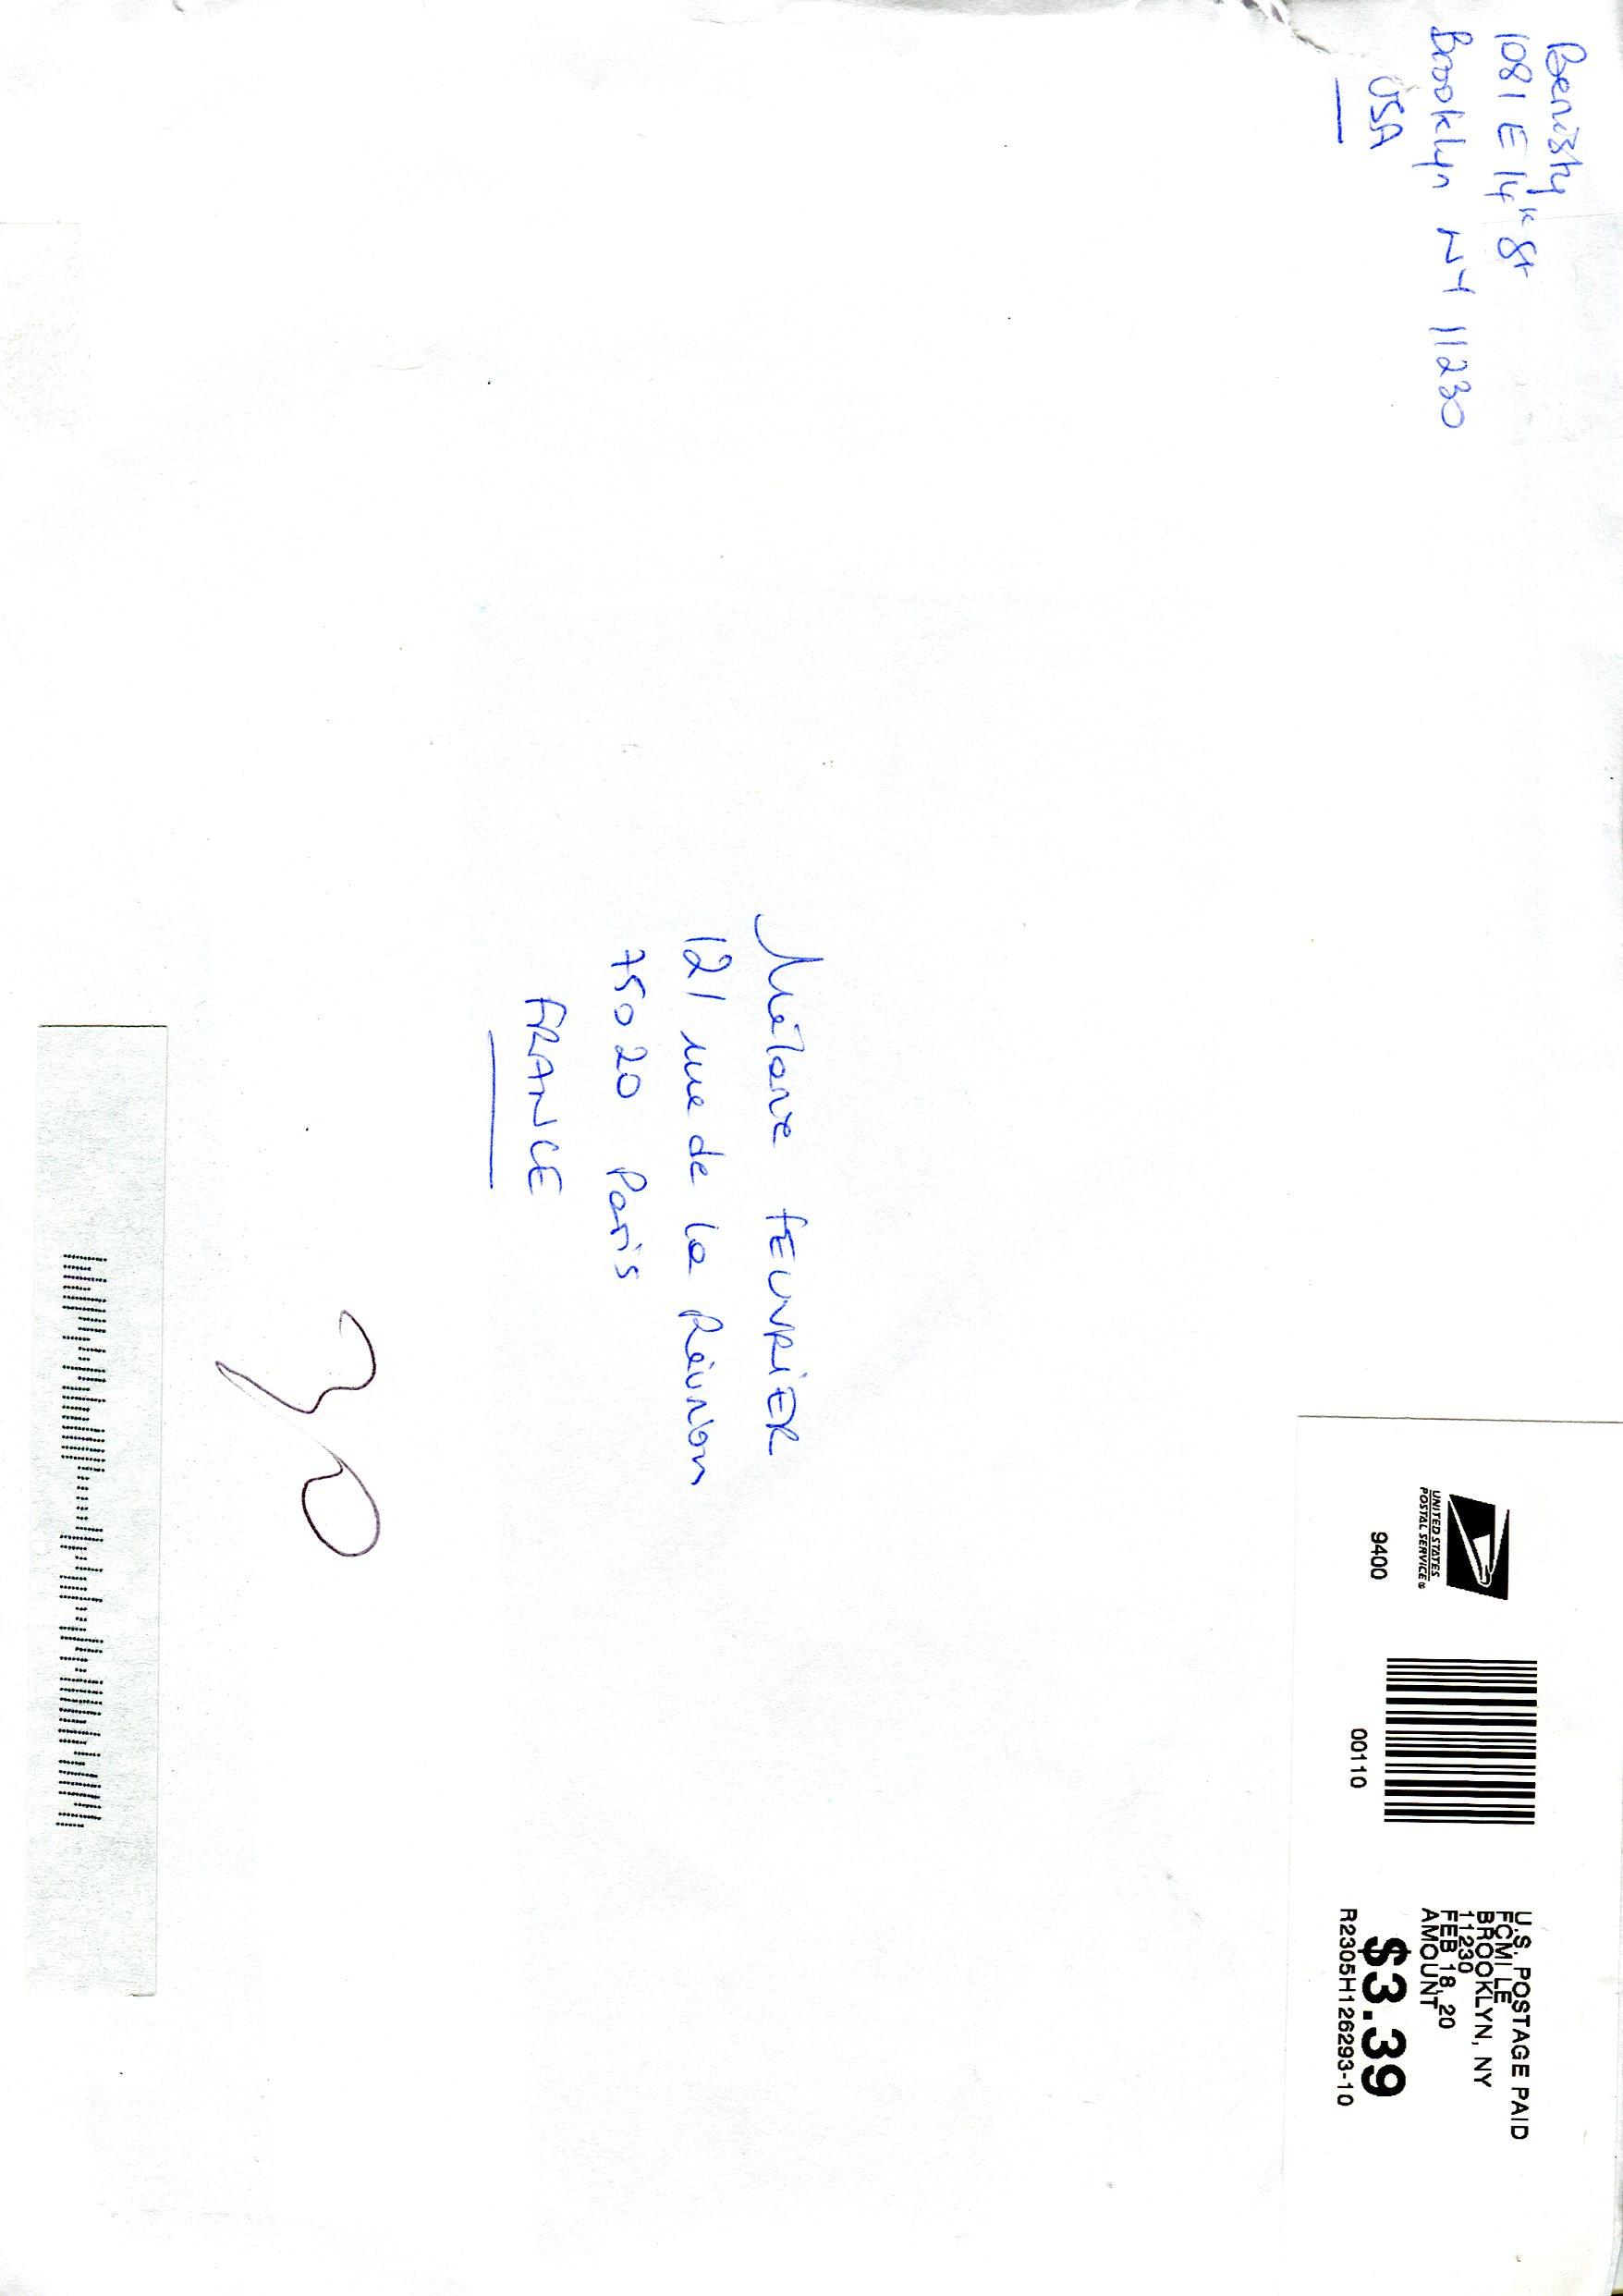 enveloppe012